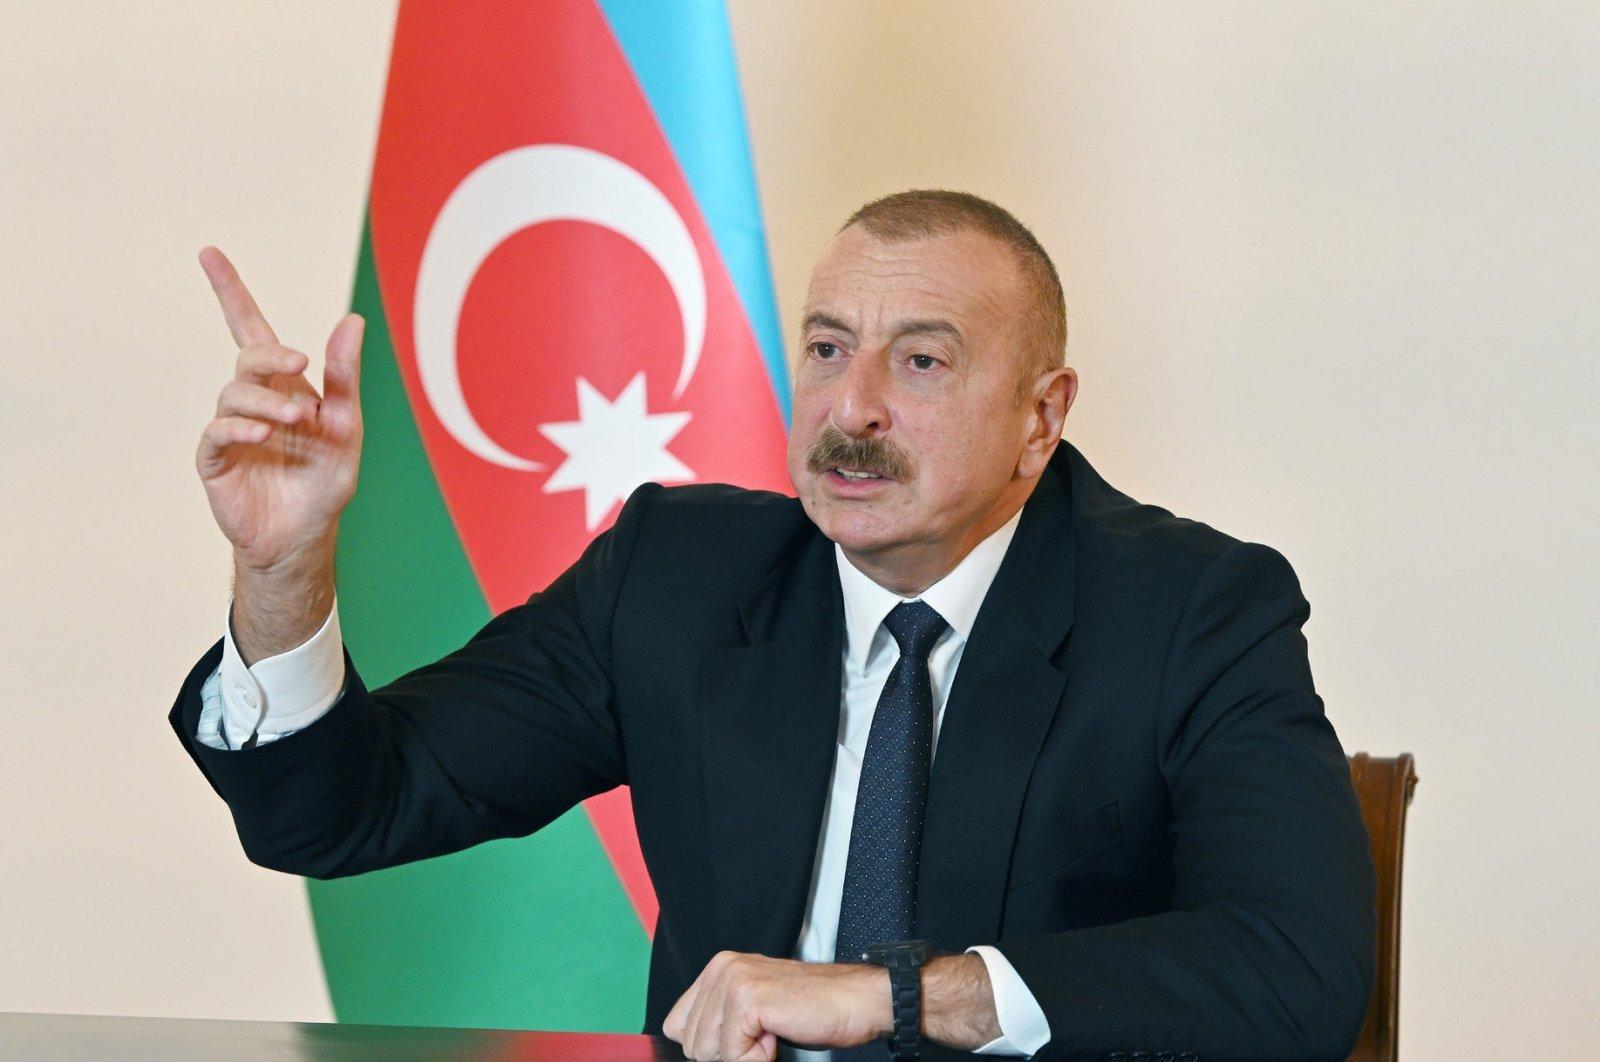 Azerbaijan's President Ilham Aliyev speaks during an address to the nation in Baku, Azerbaijan Oct. 9, 2020. (REUTERS)